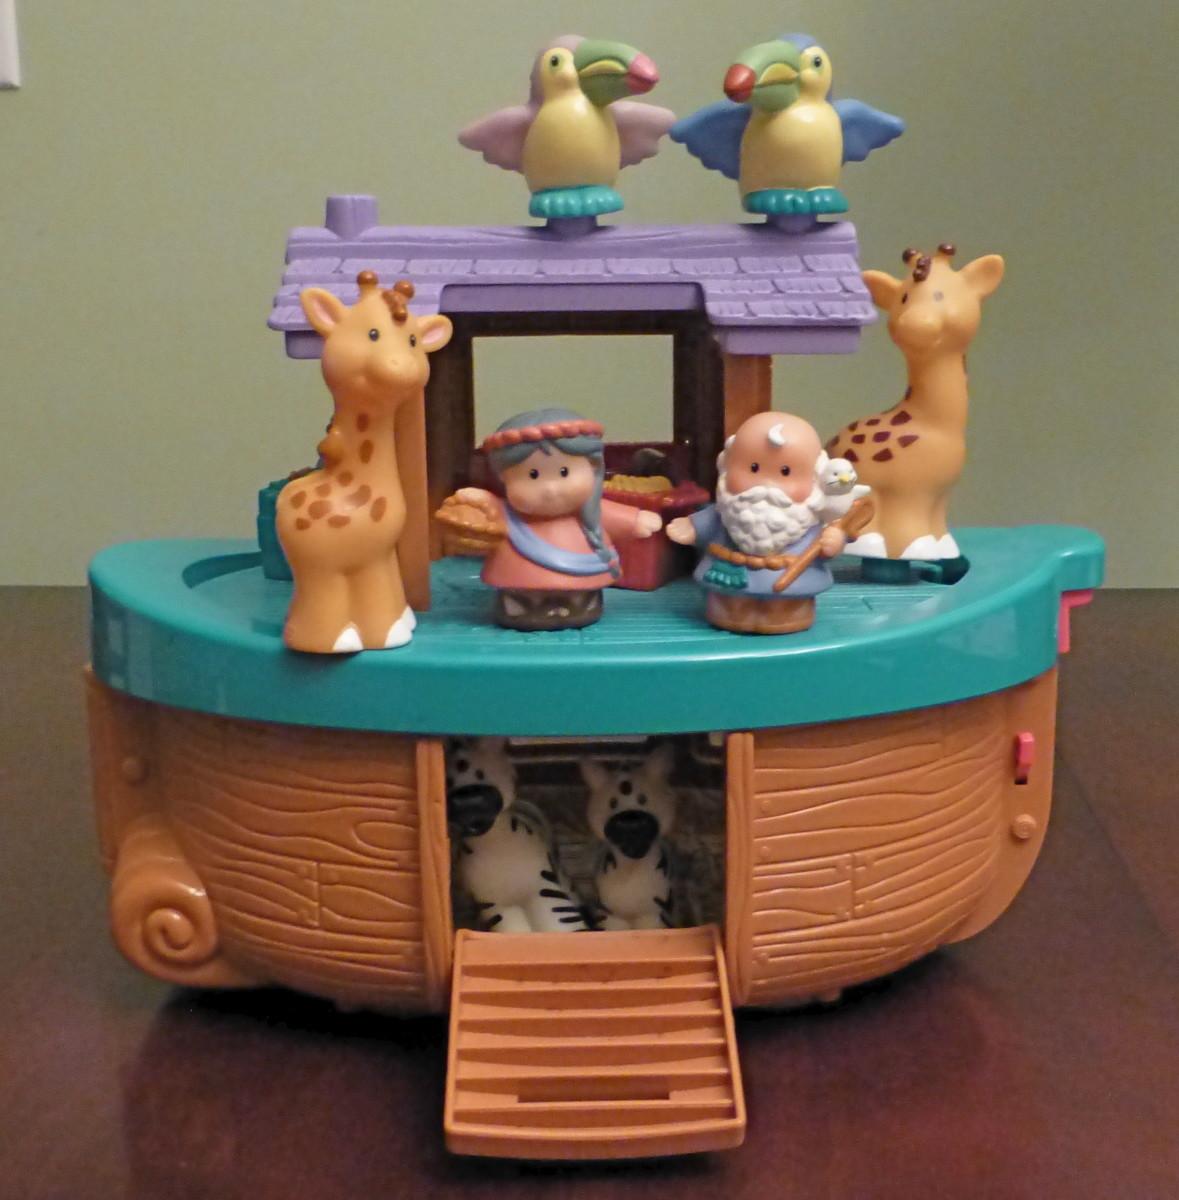 Best Noah's Ark Picture Books